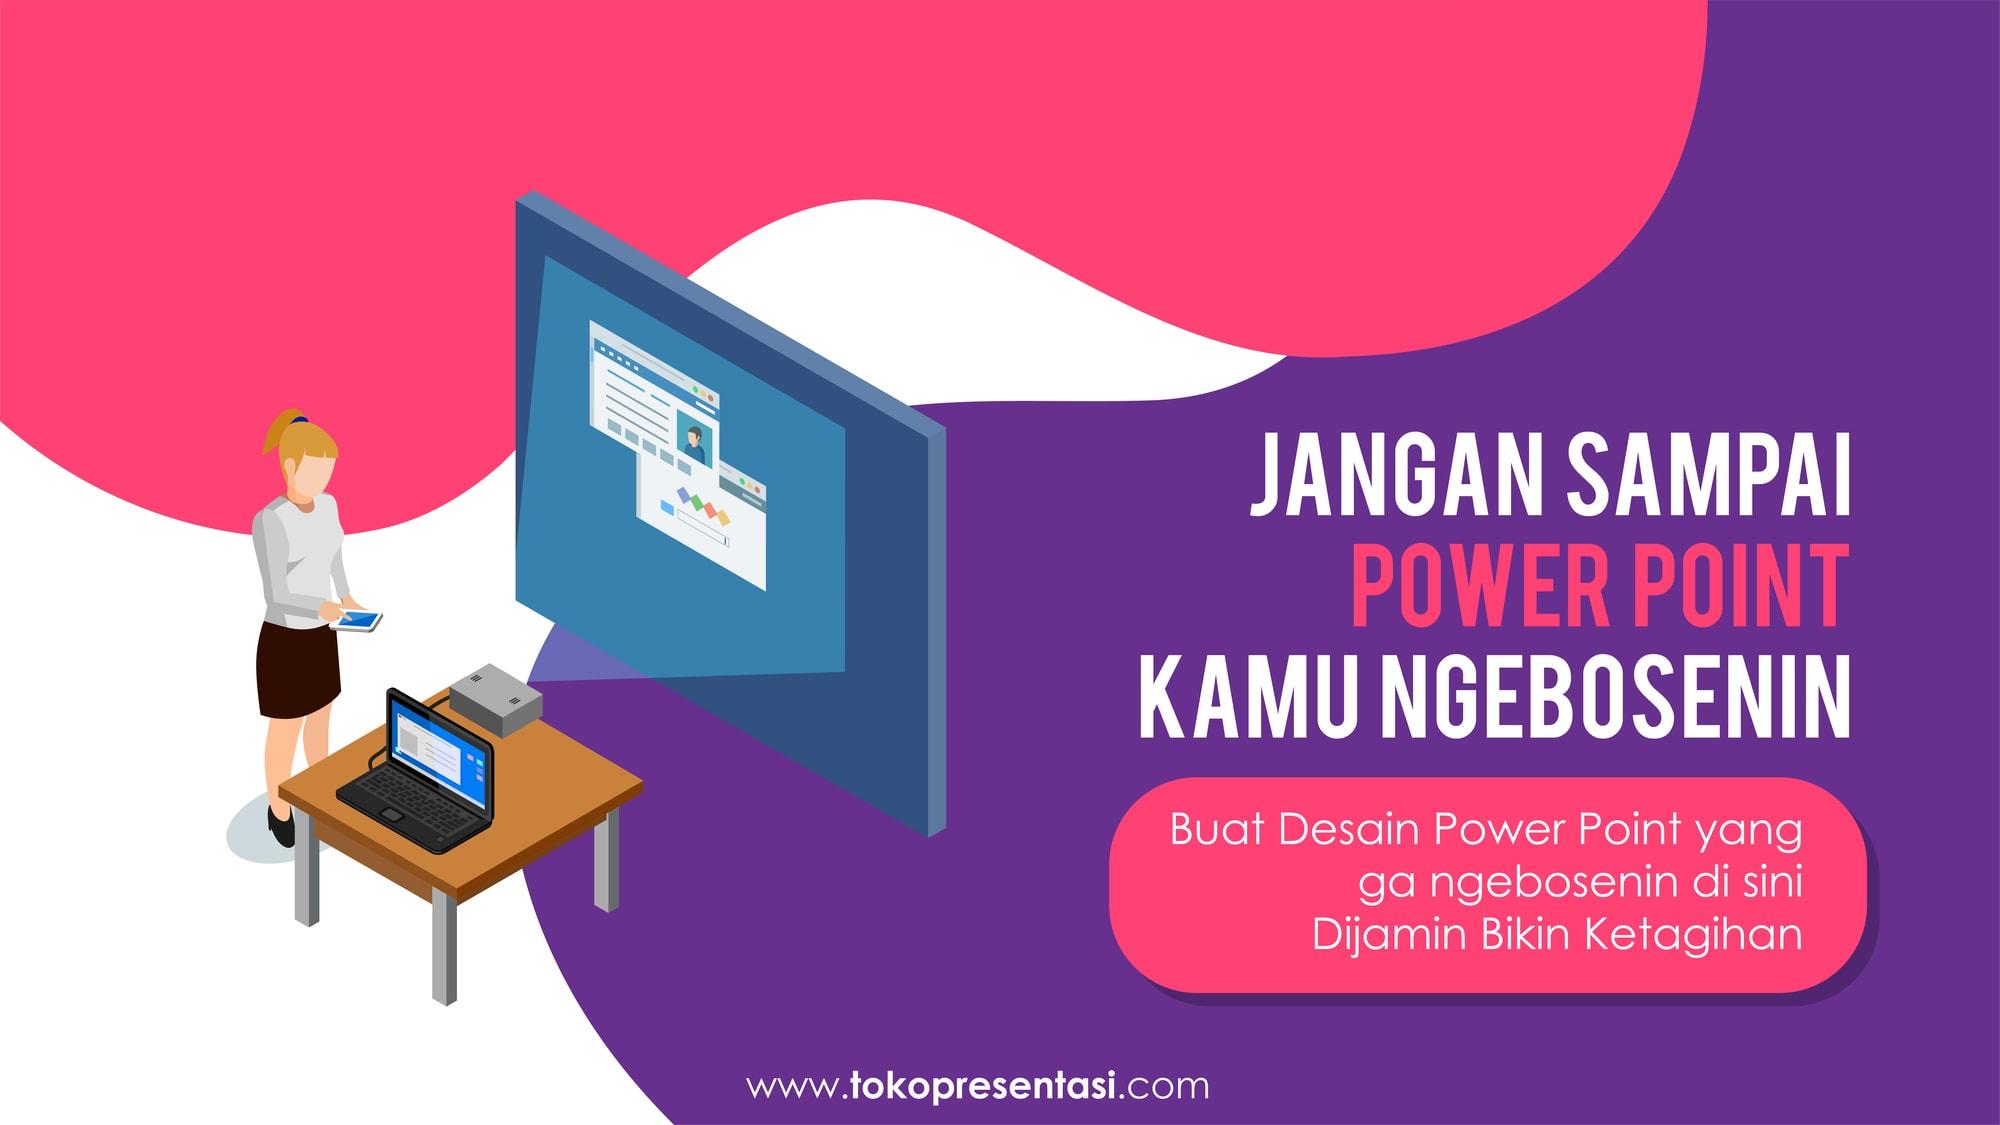 Jasa Presentasi Aceh Jasa Desain Presentasi Terbaik Tokopresentasi